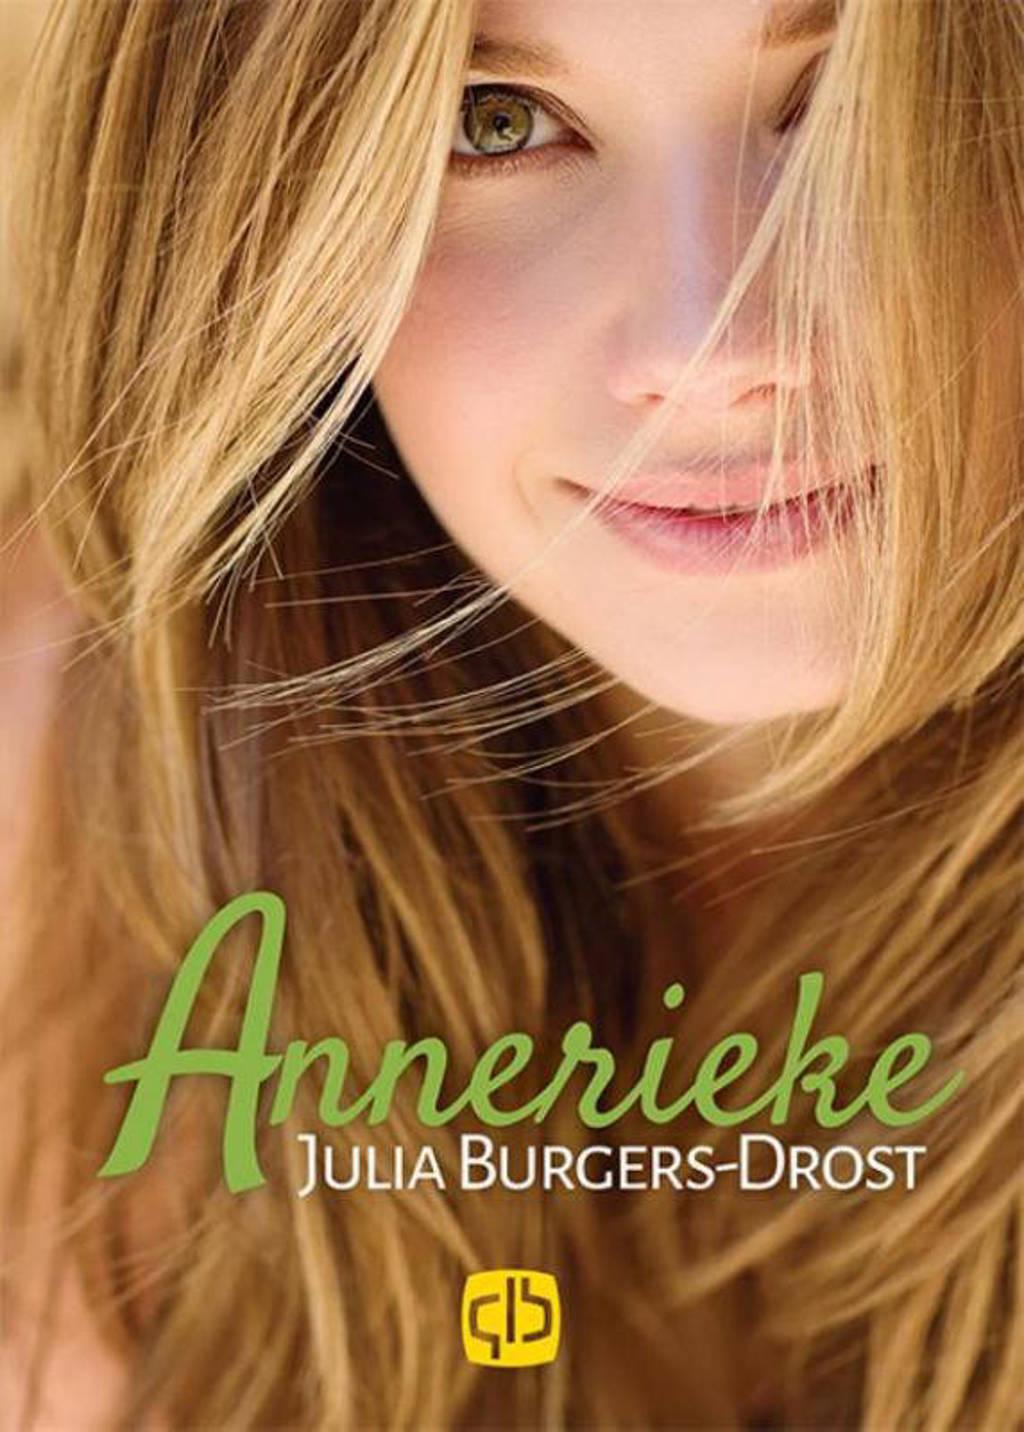 Spiegelserie: Annerieke - Julia Burgers-Drost